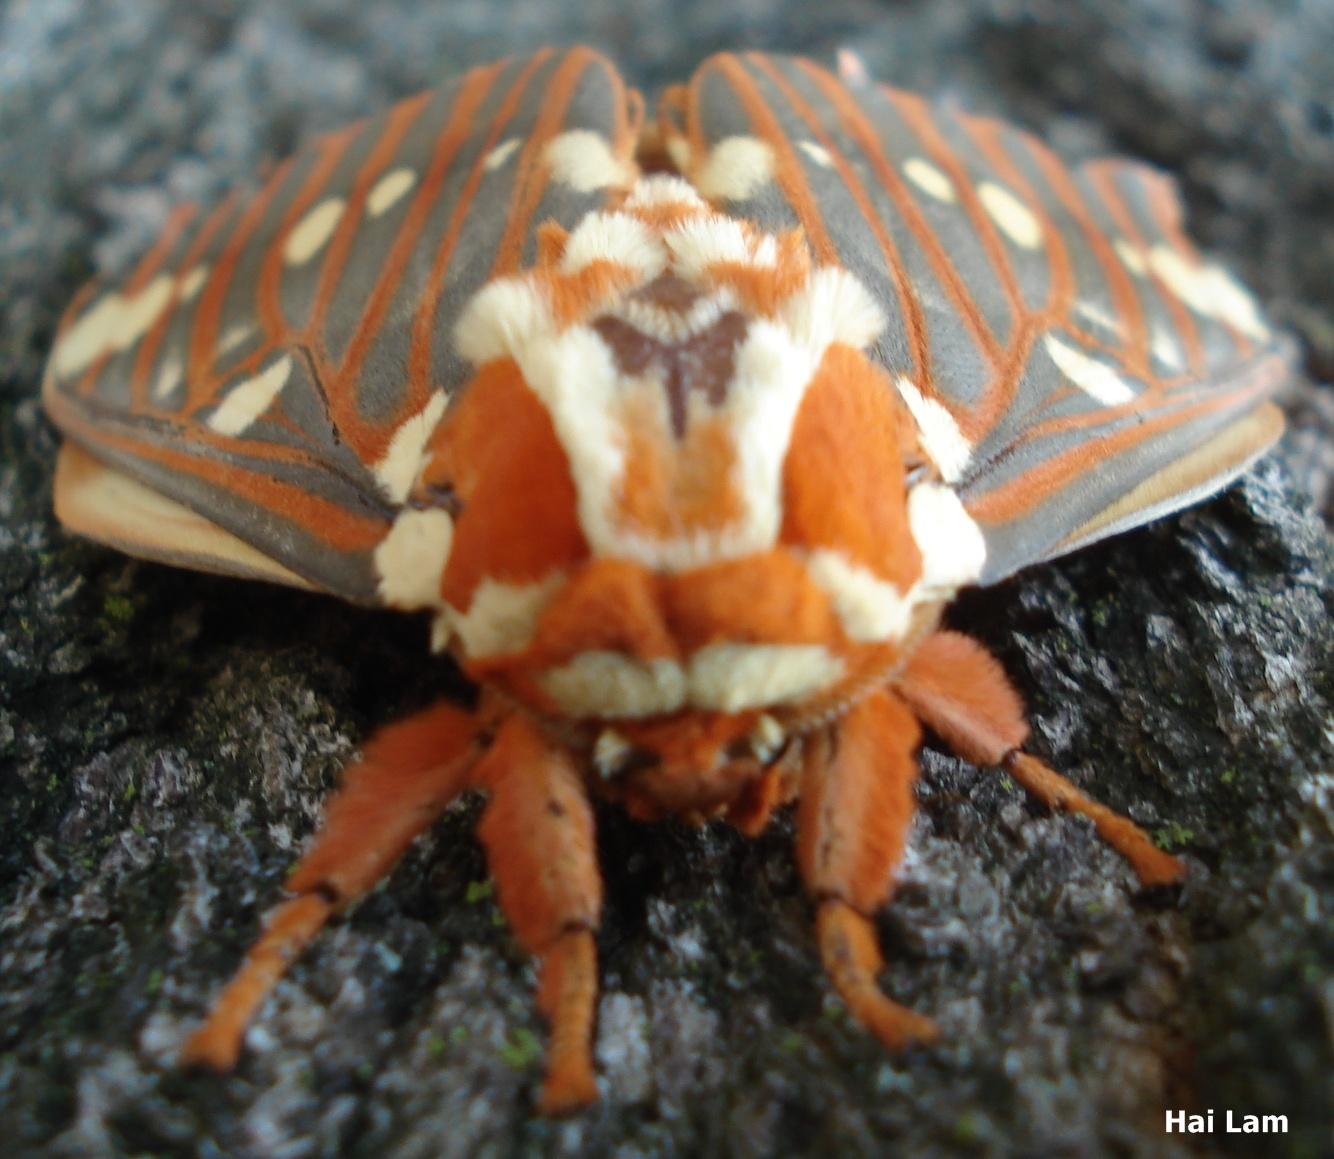 Gray Caterpillars That Are Big: Royal Walnut Moth Citheronia Regalis (Fabricius, 1793